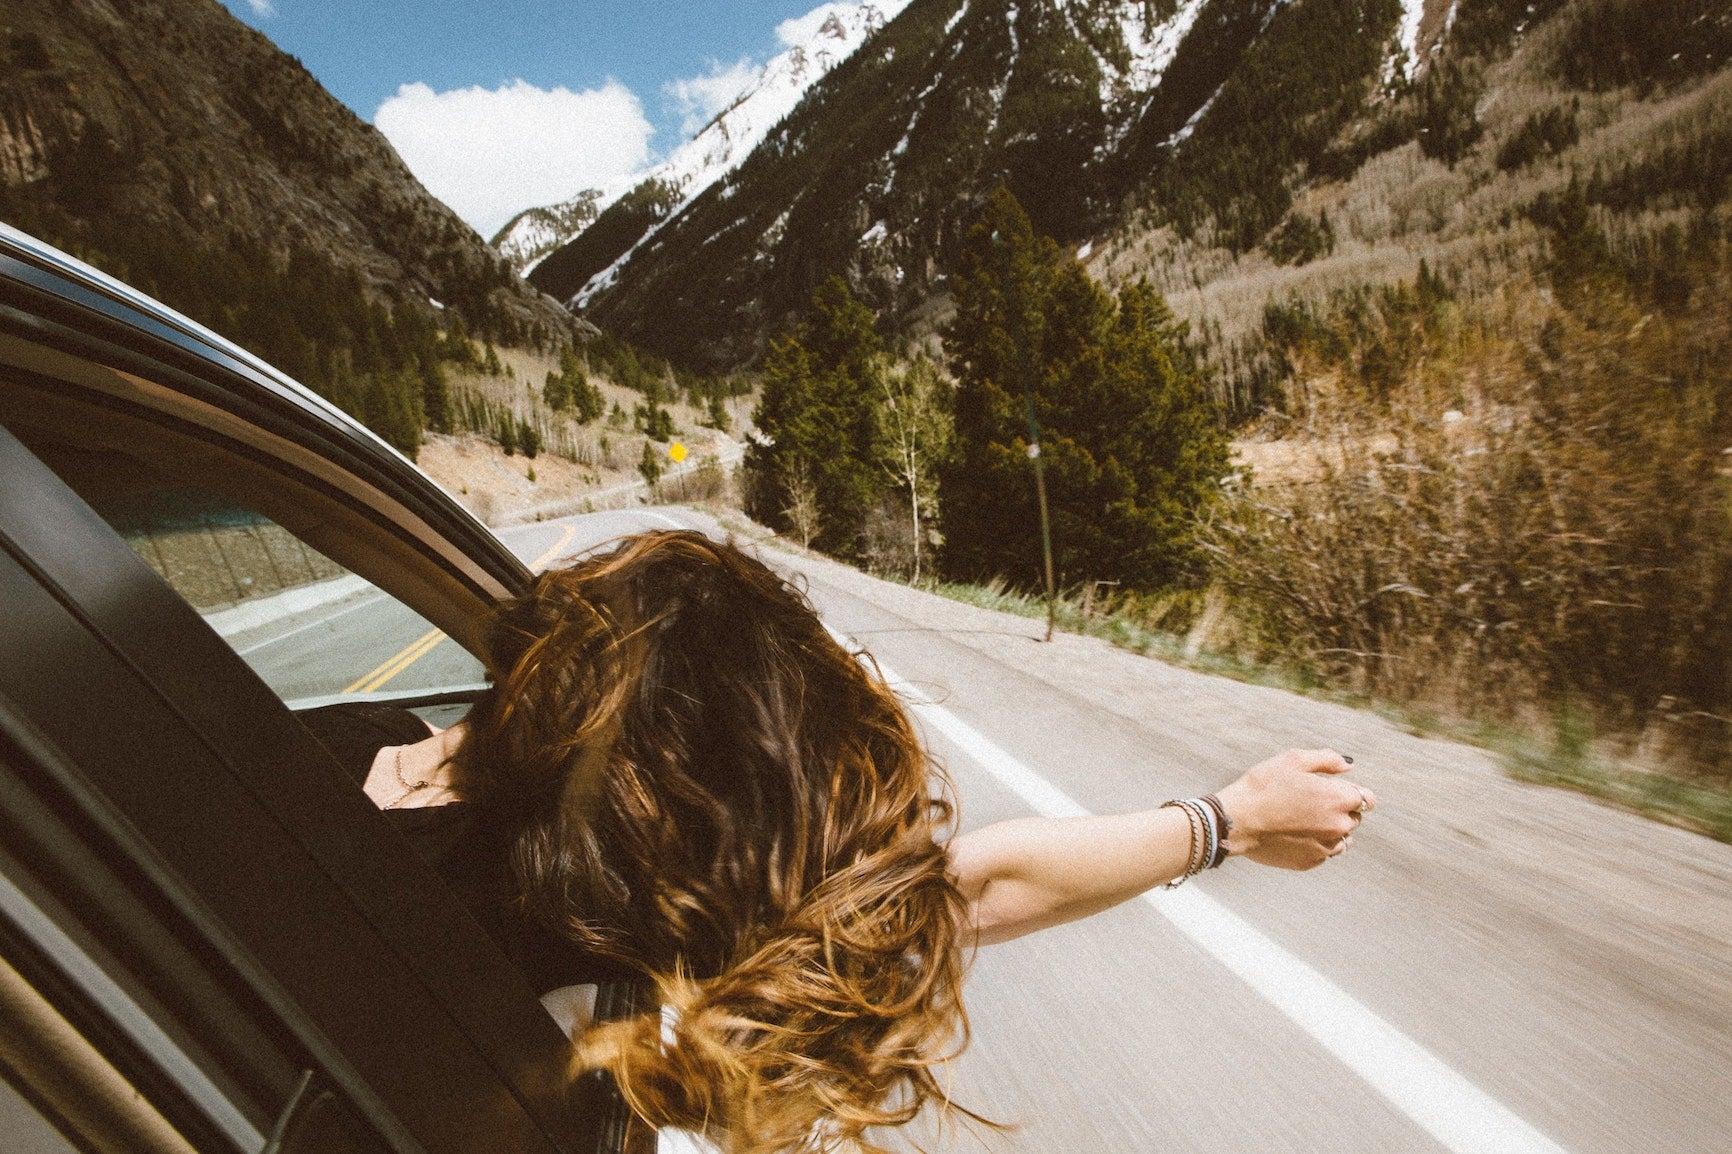 woman in car on road trip